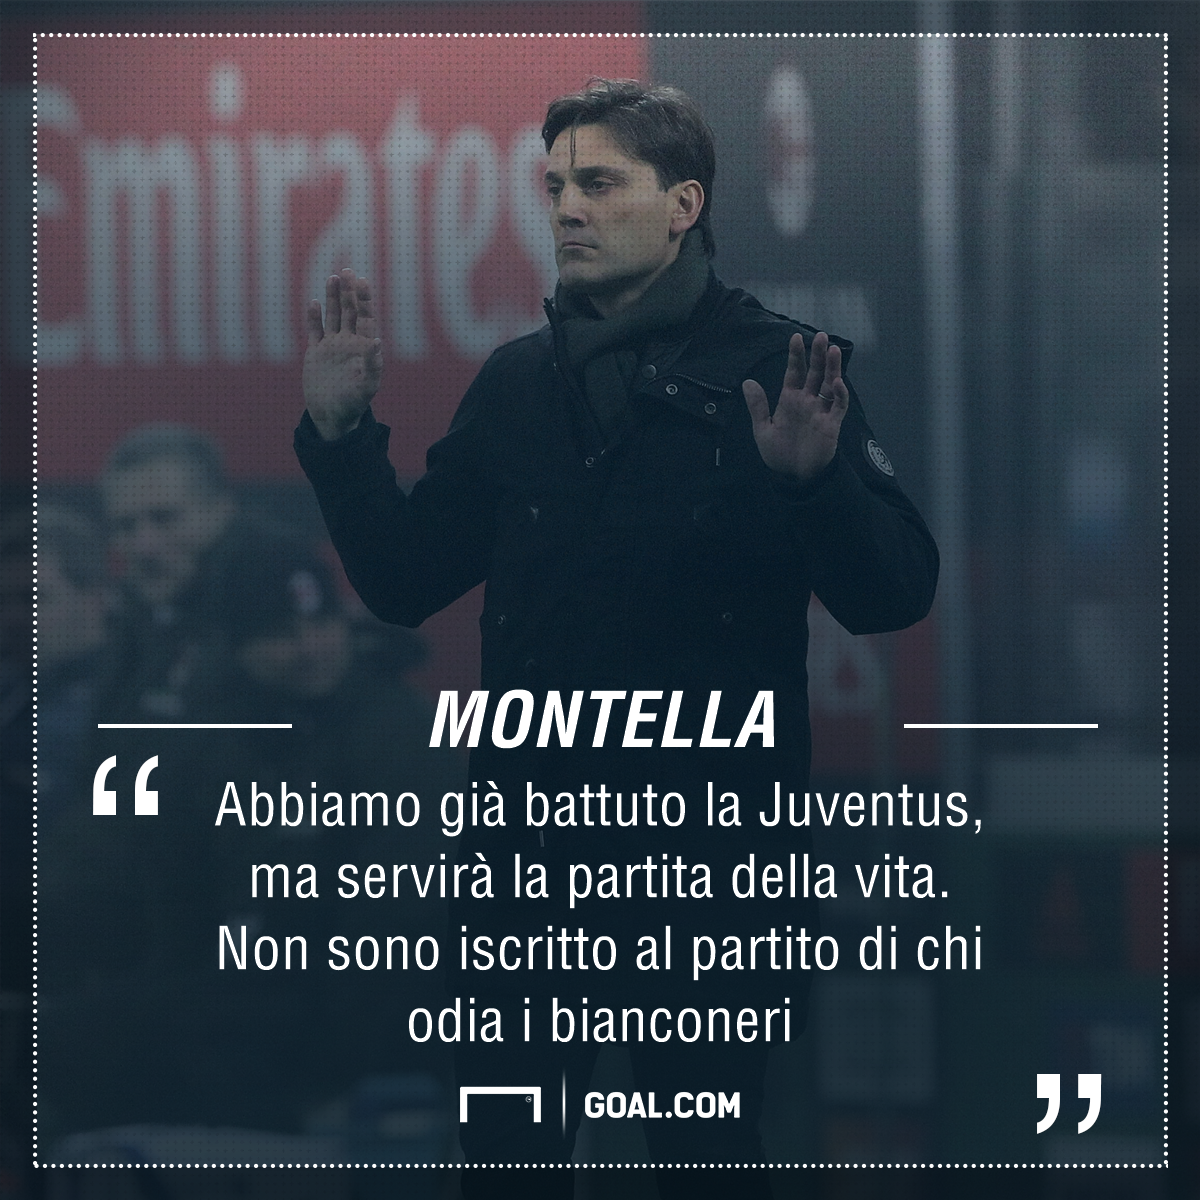 Montella: